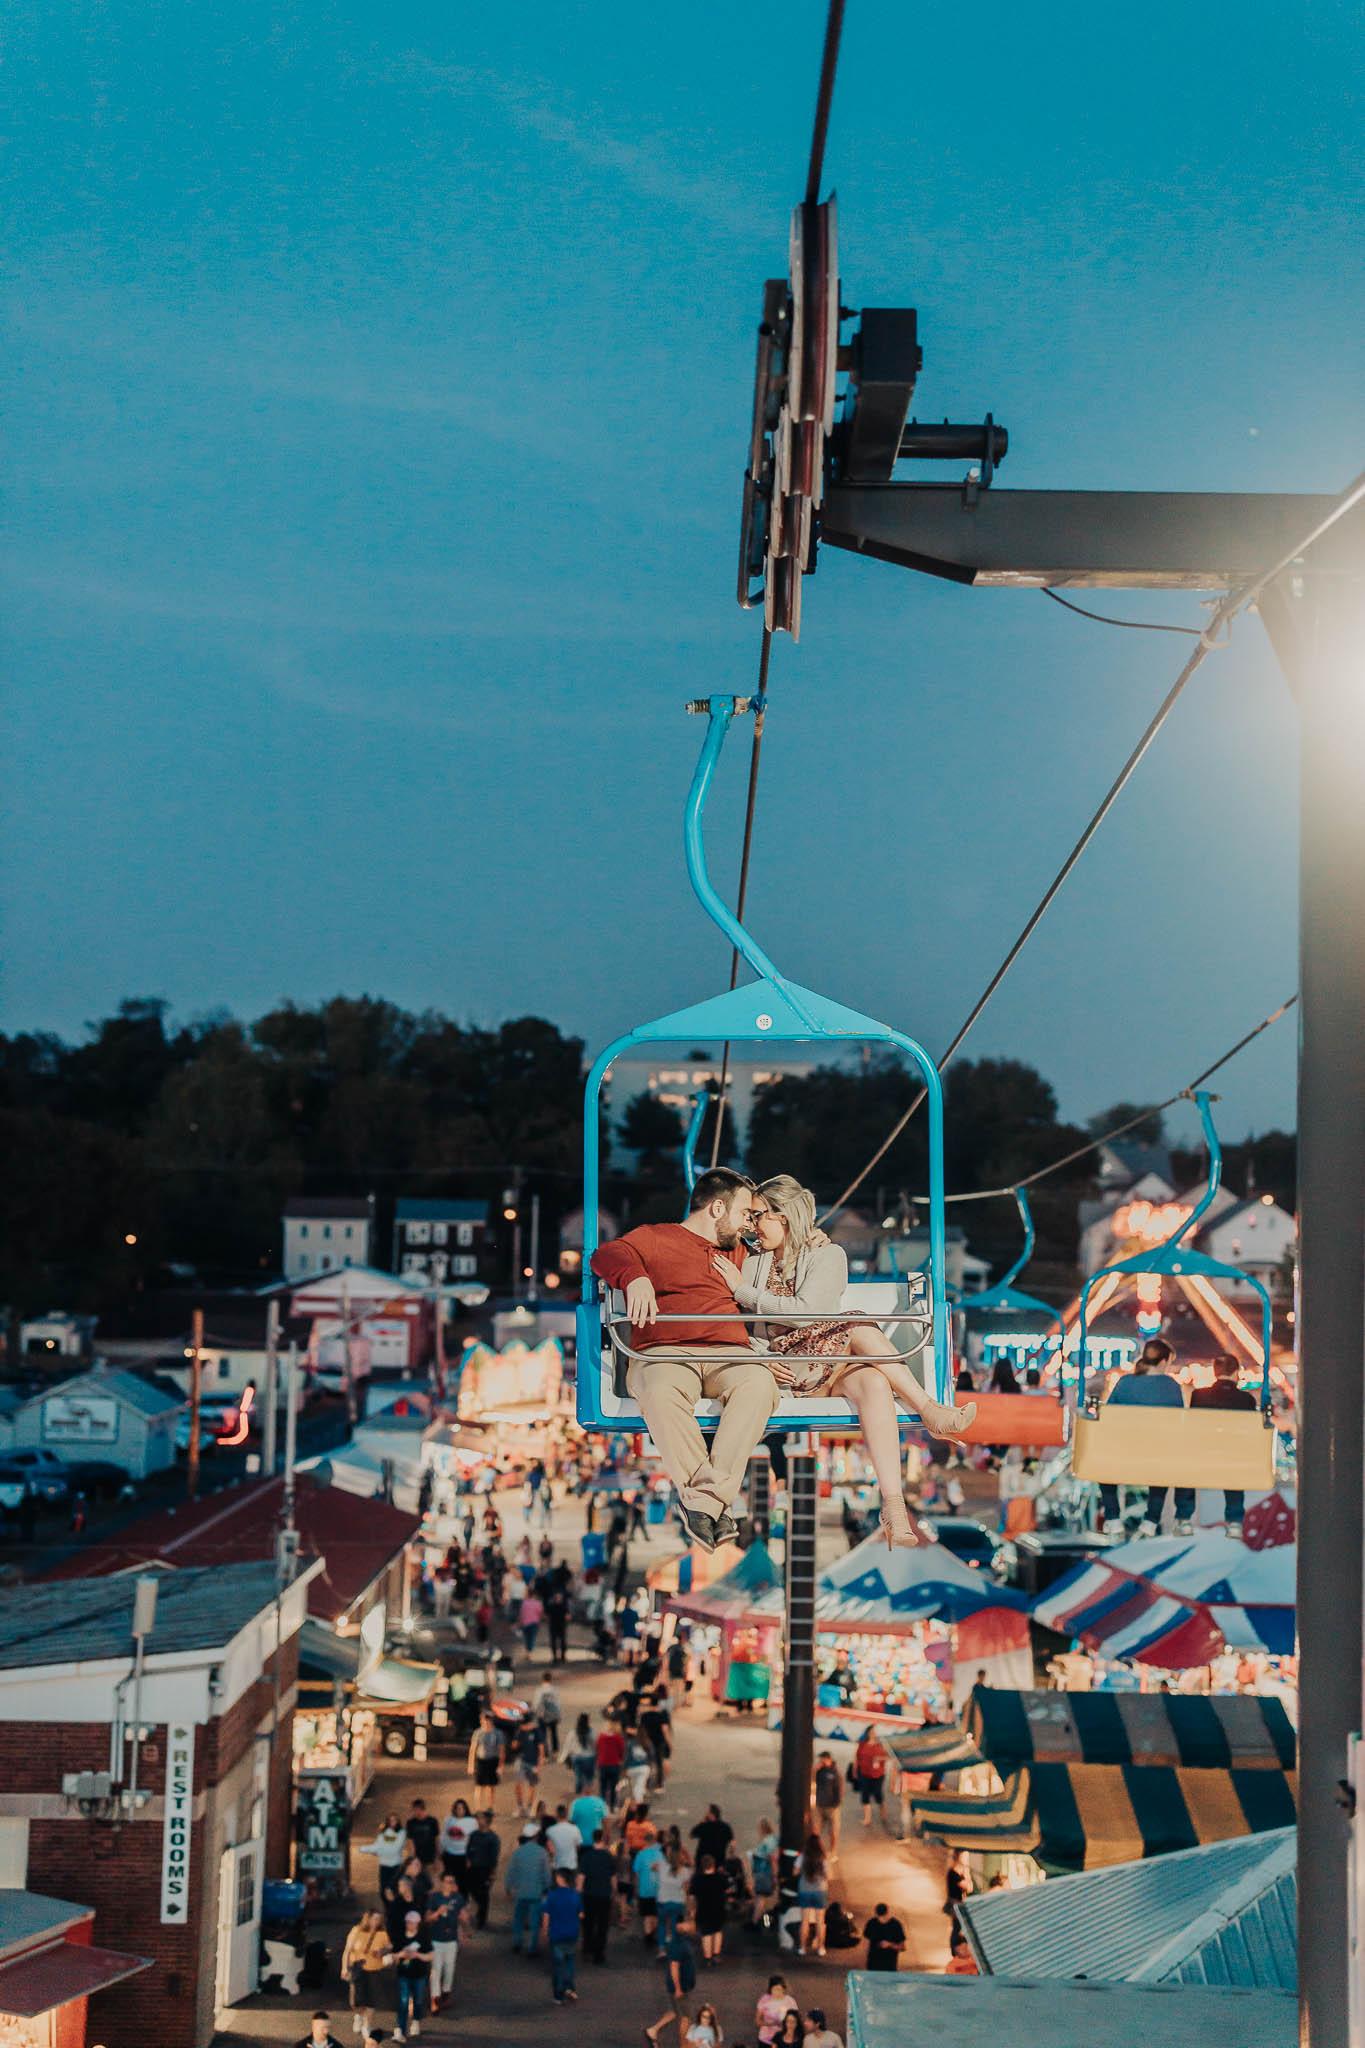 bloomsburg-fair-engagement-5558.jpg